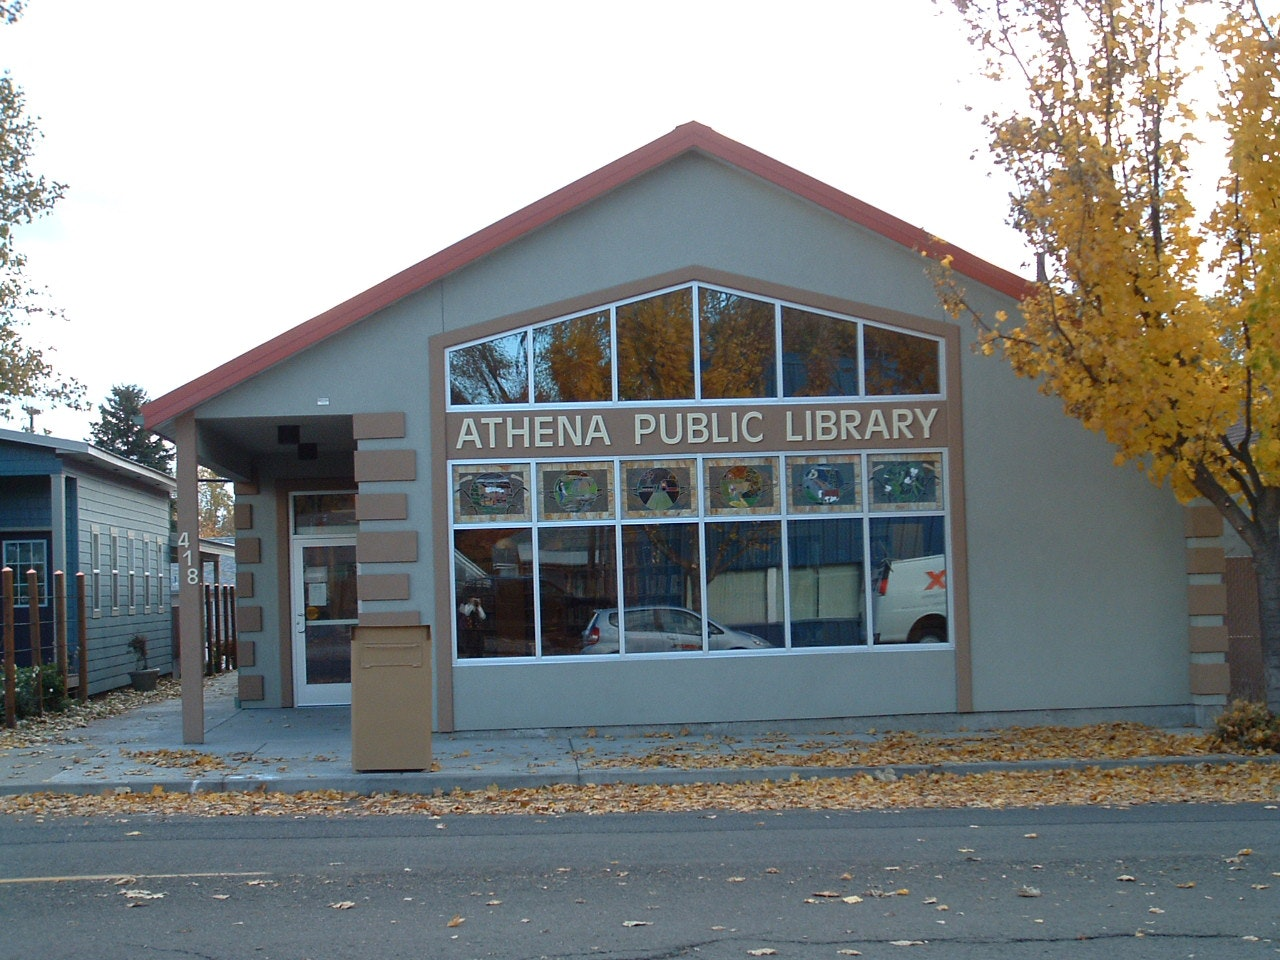 Athena Public Library building